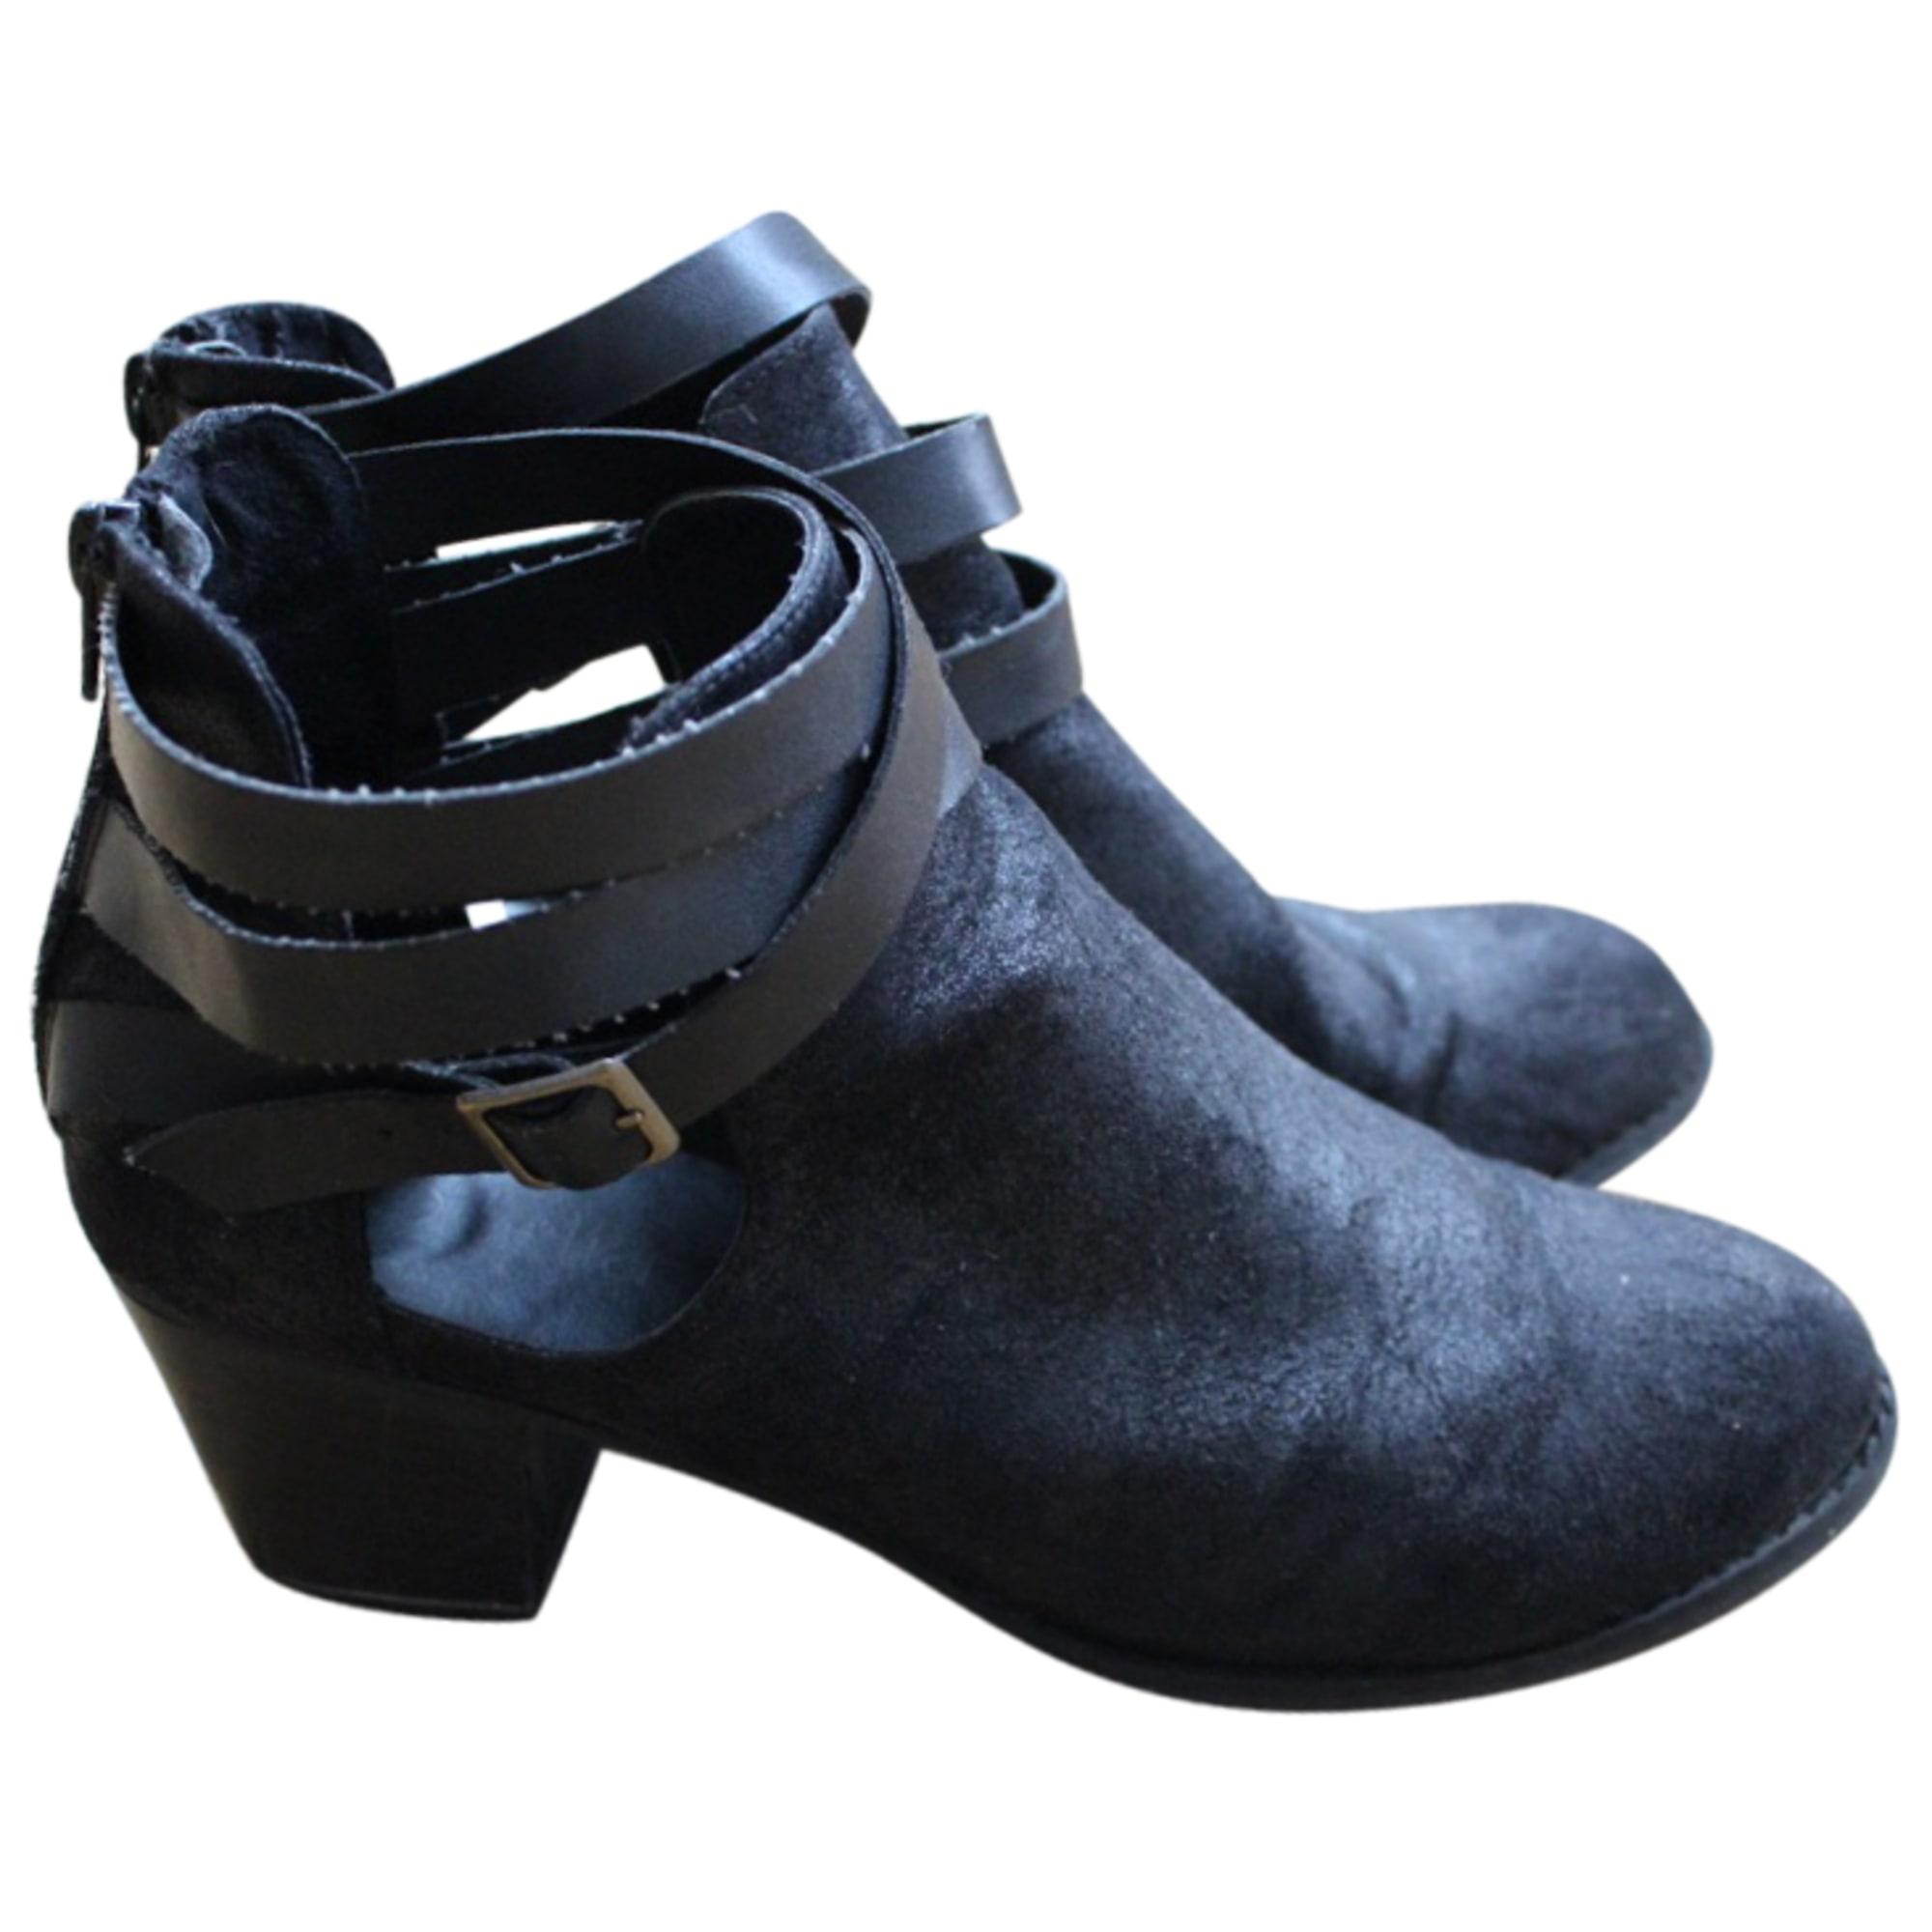 Bottines & low boots à talons URBAN OUTFITTERS Noir